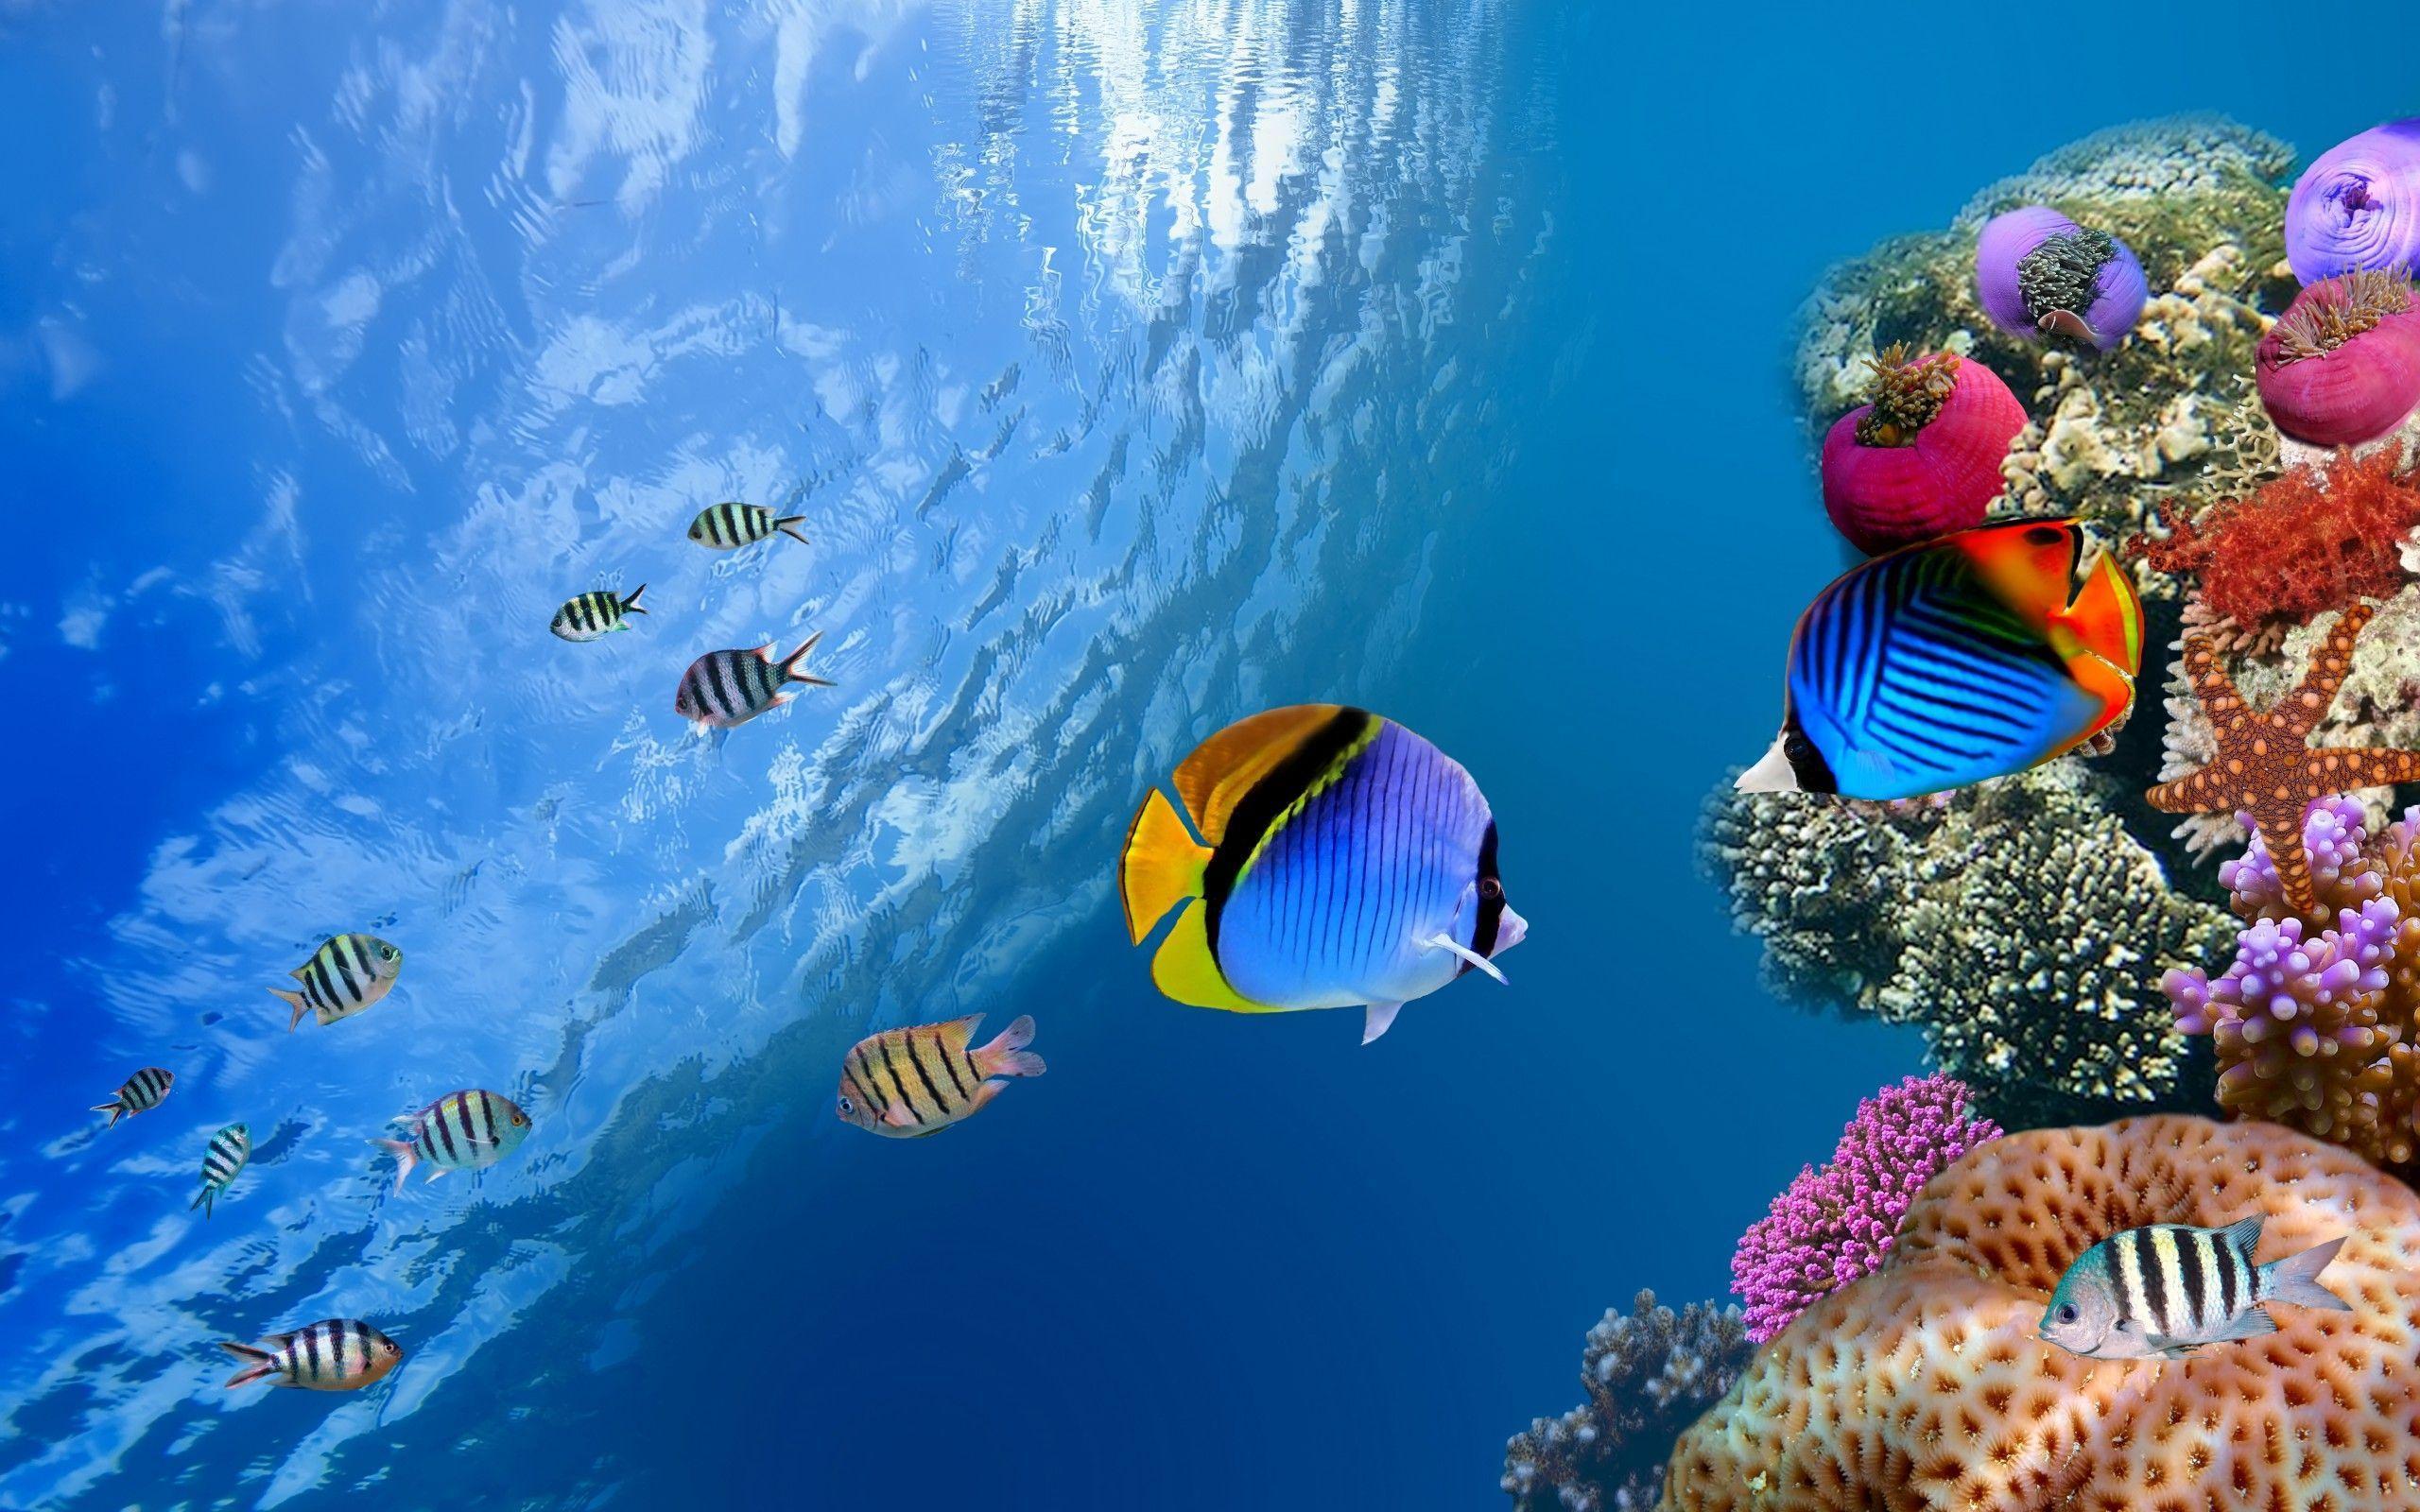 503 <b>Fish</b> HD <b>Wallpapers</b> | <b>Backgrounds</b> - <b>Wallpaper</b> Abyss